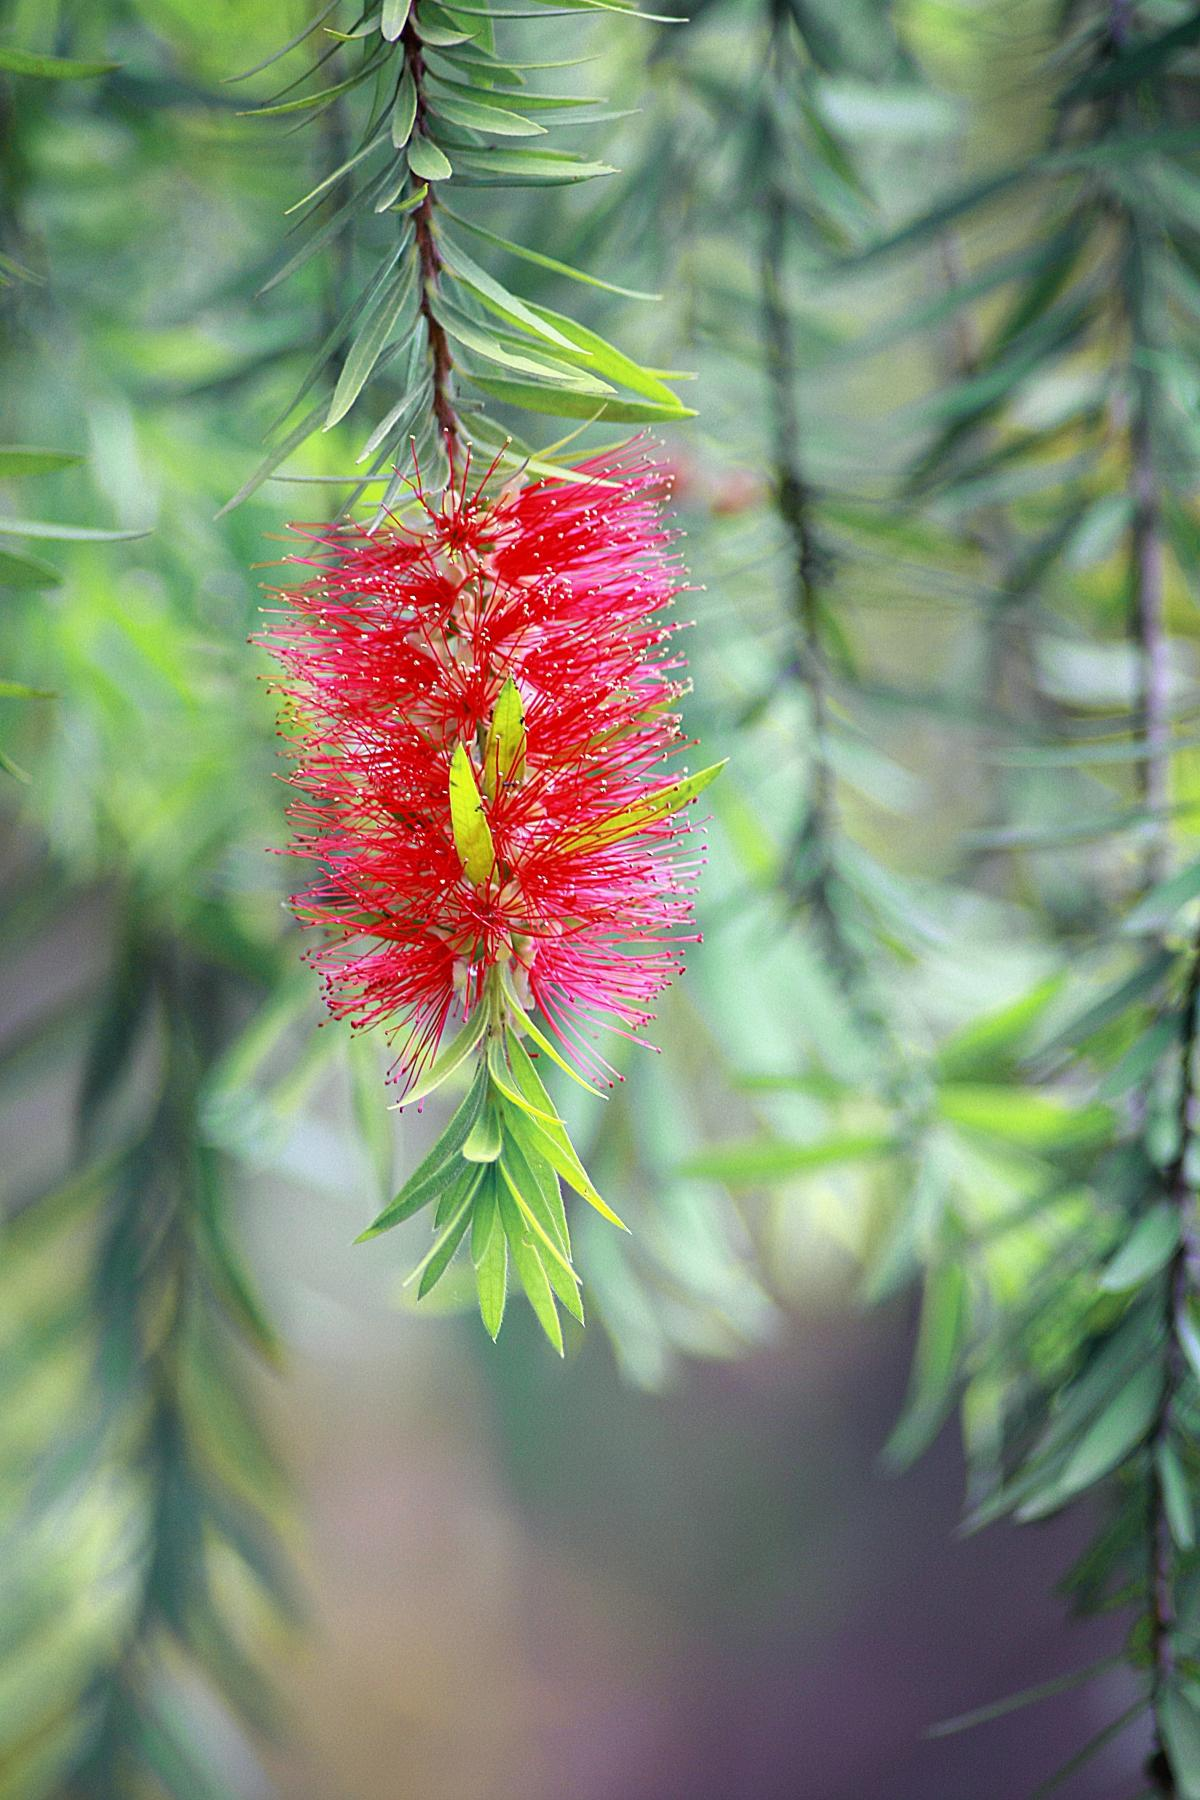 Adult aromatherapy arrangement bloom #53407